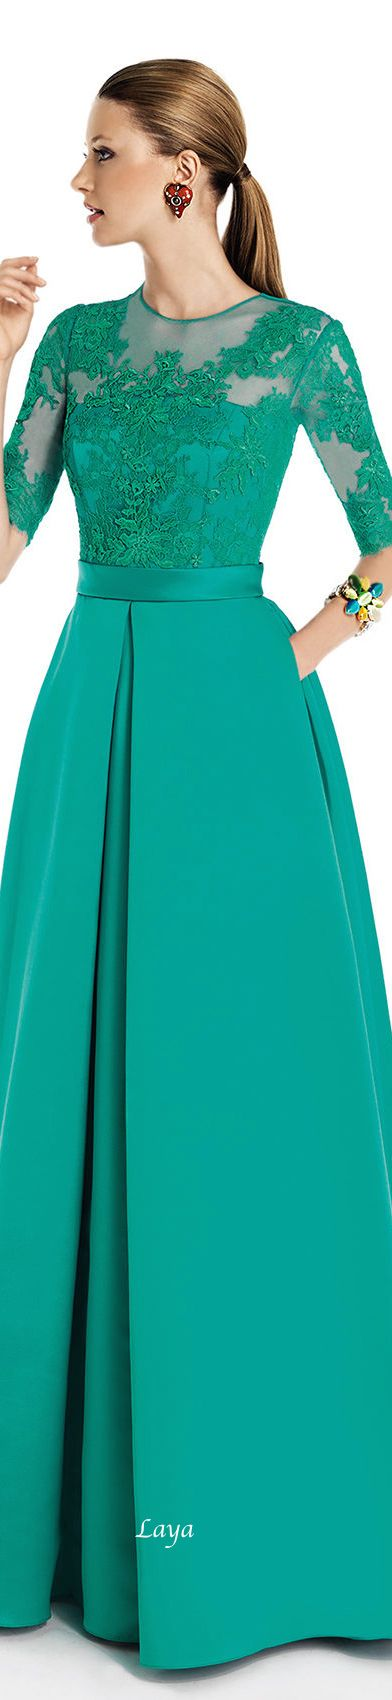 Pronovias Cocktail Dress 2014 https://www.pinterest.com/LayaFashions/pronovias/